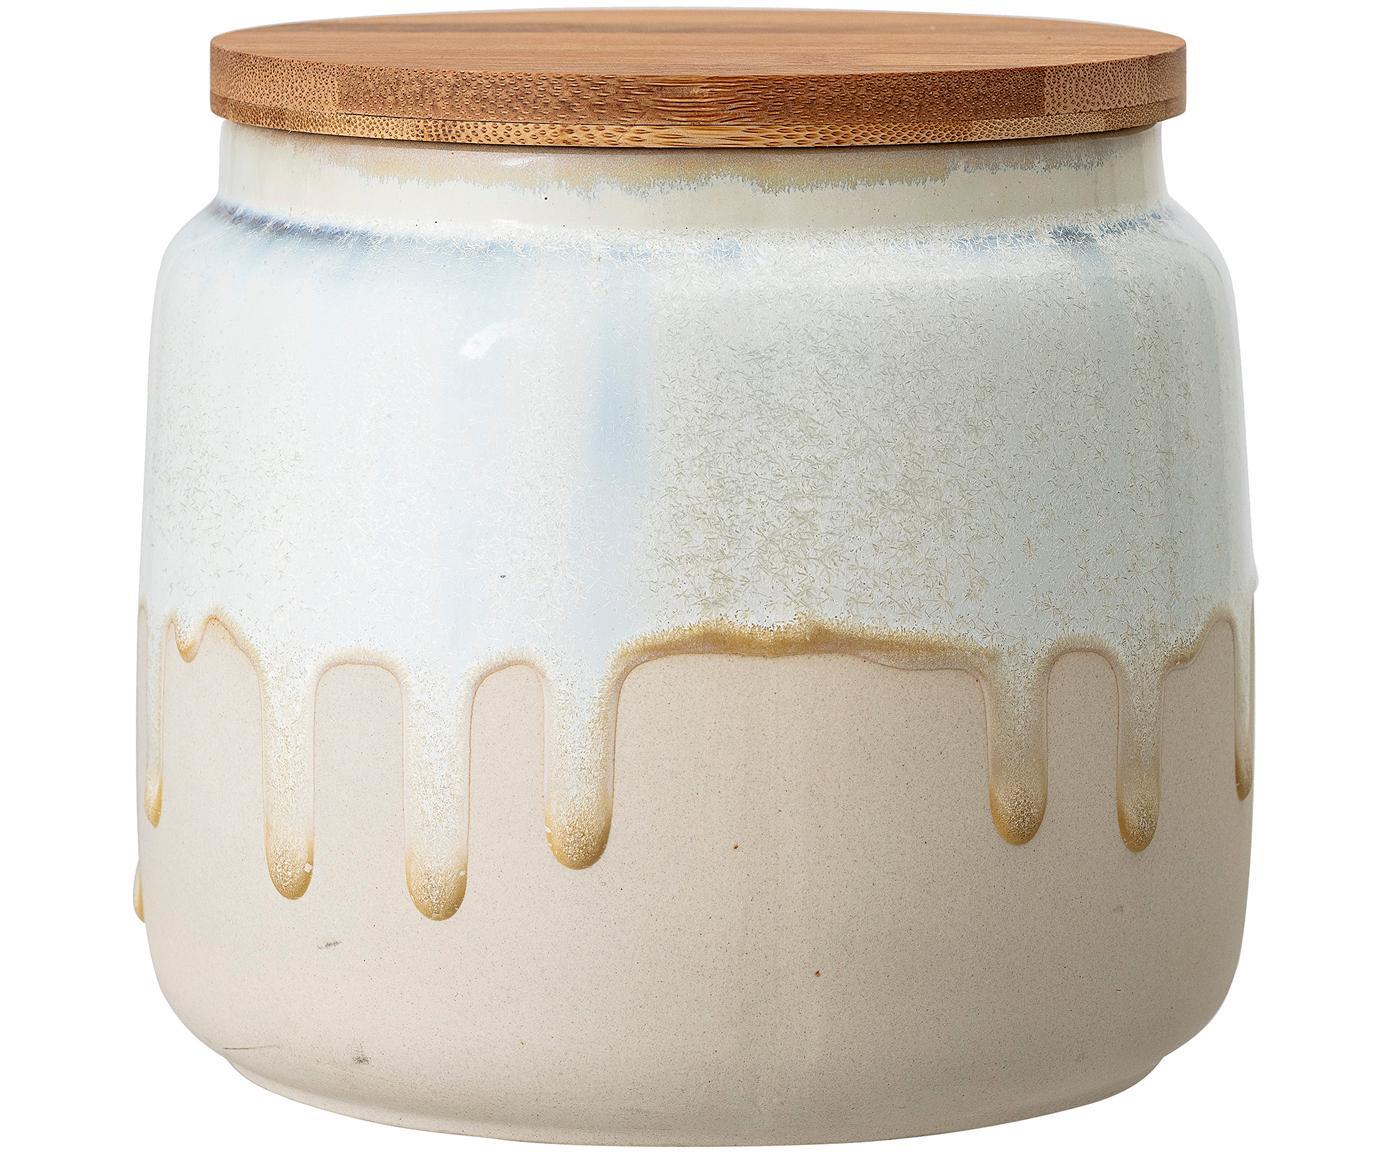 Bote artesanal Terrain, Blanco crudo, beige, bambú, Ø 16 x Al 14 cm